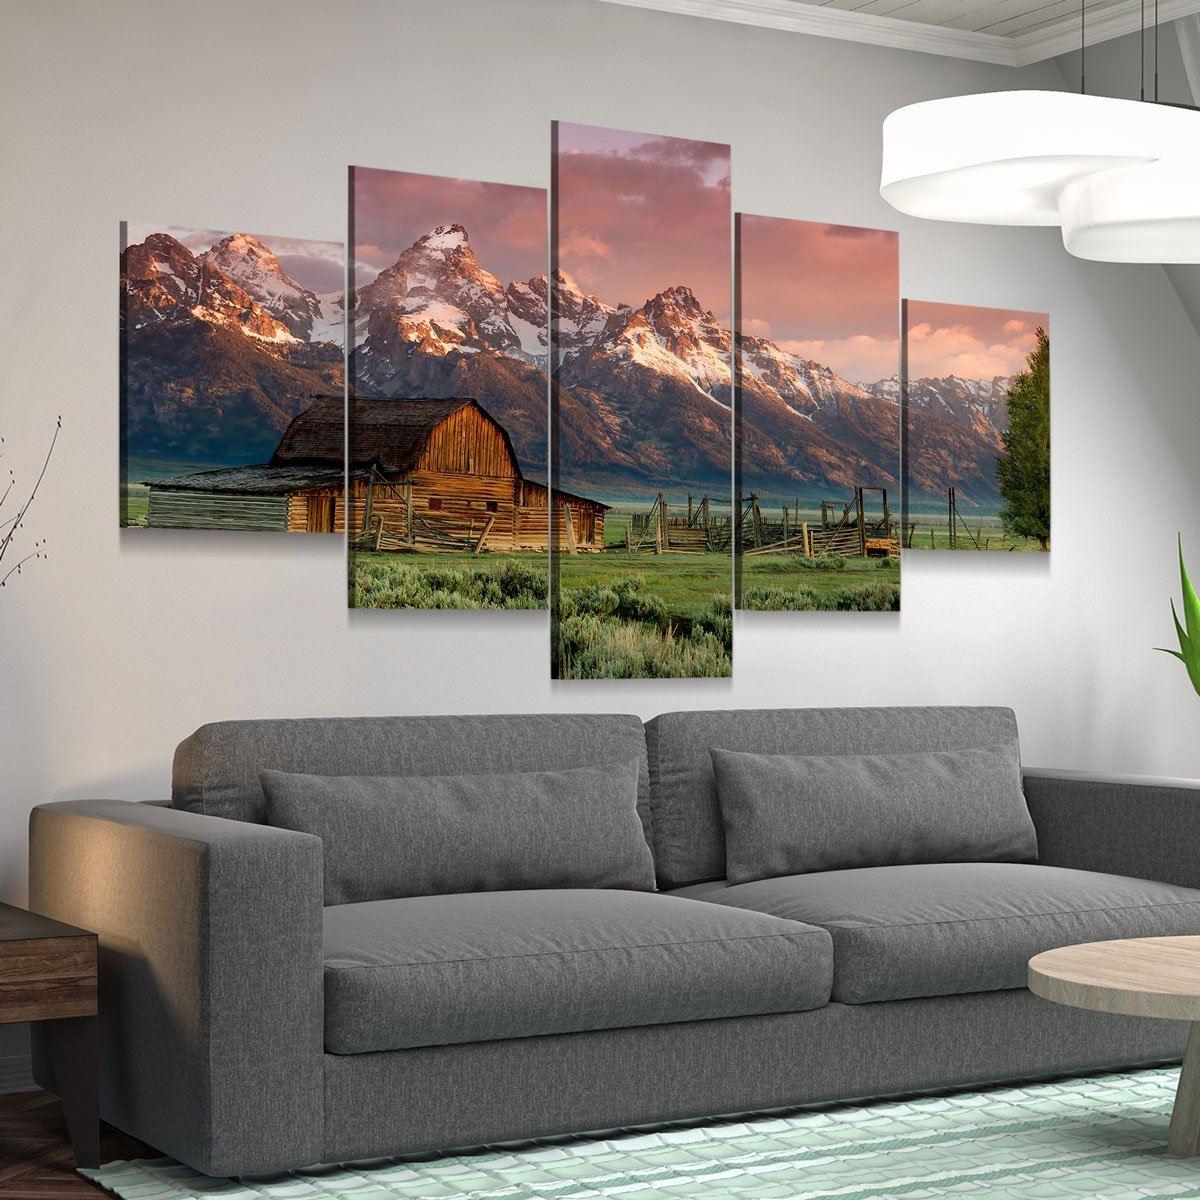 Barn In Grand Teton National Park 5 panel canvas wall art